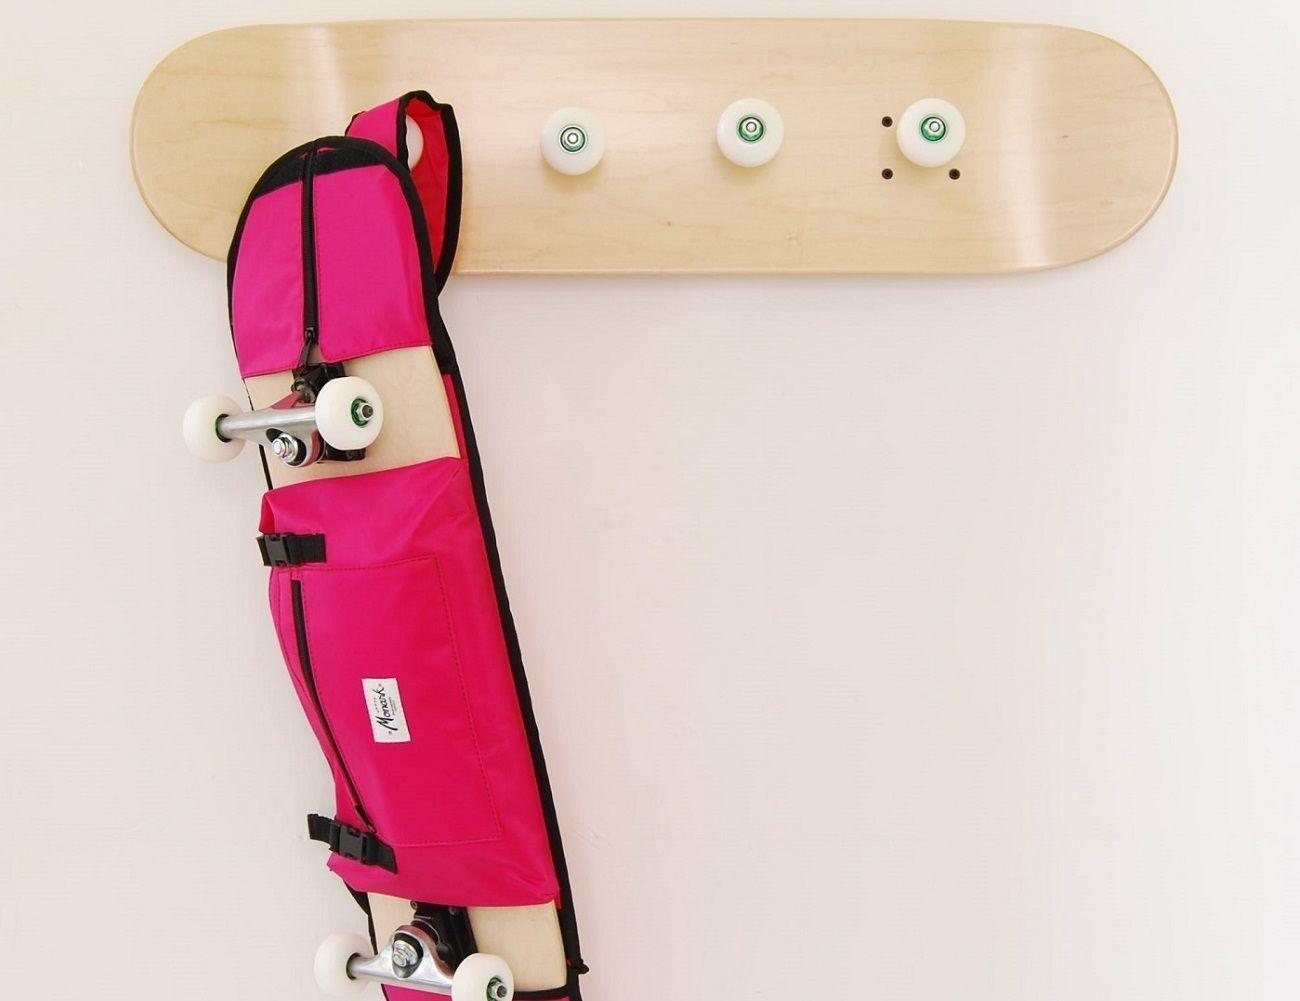 Pivot Grind Coat Rack By Skate-Home